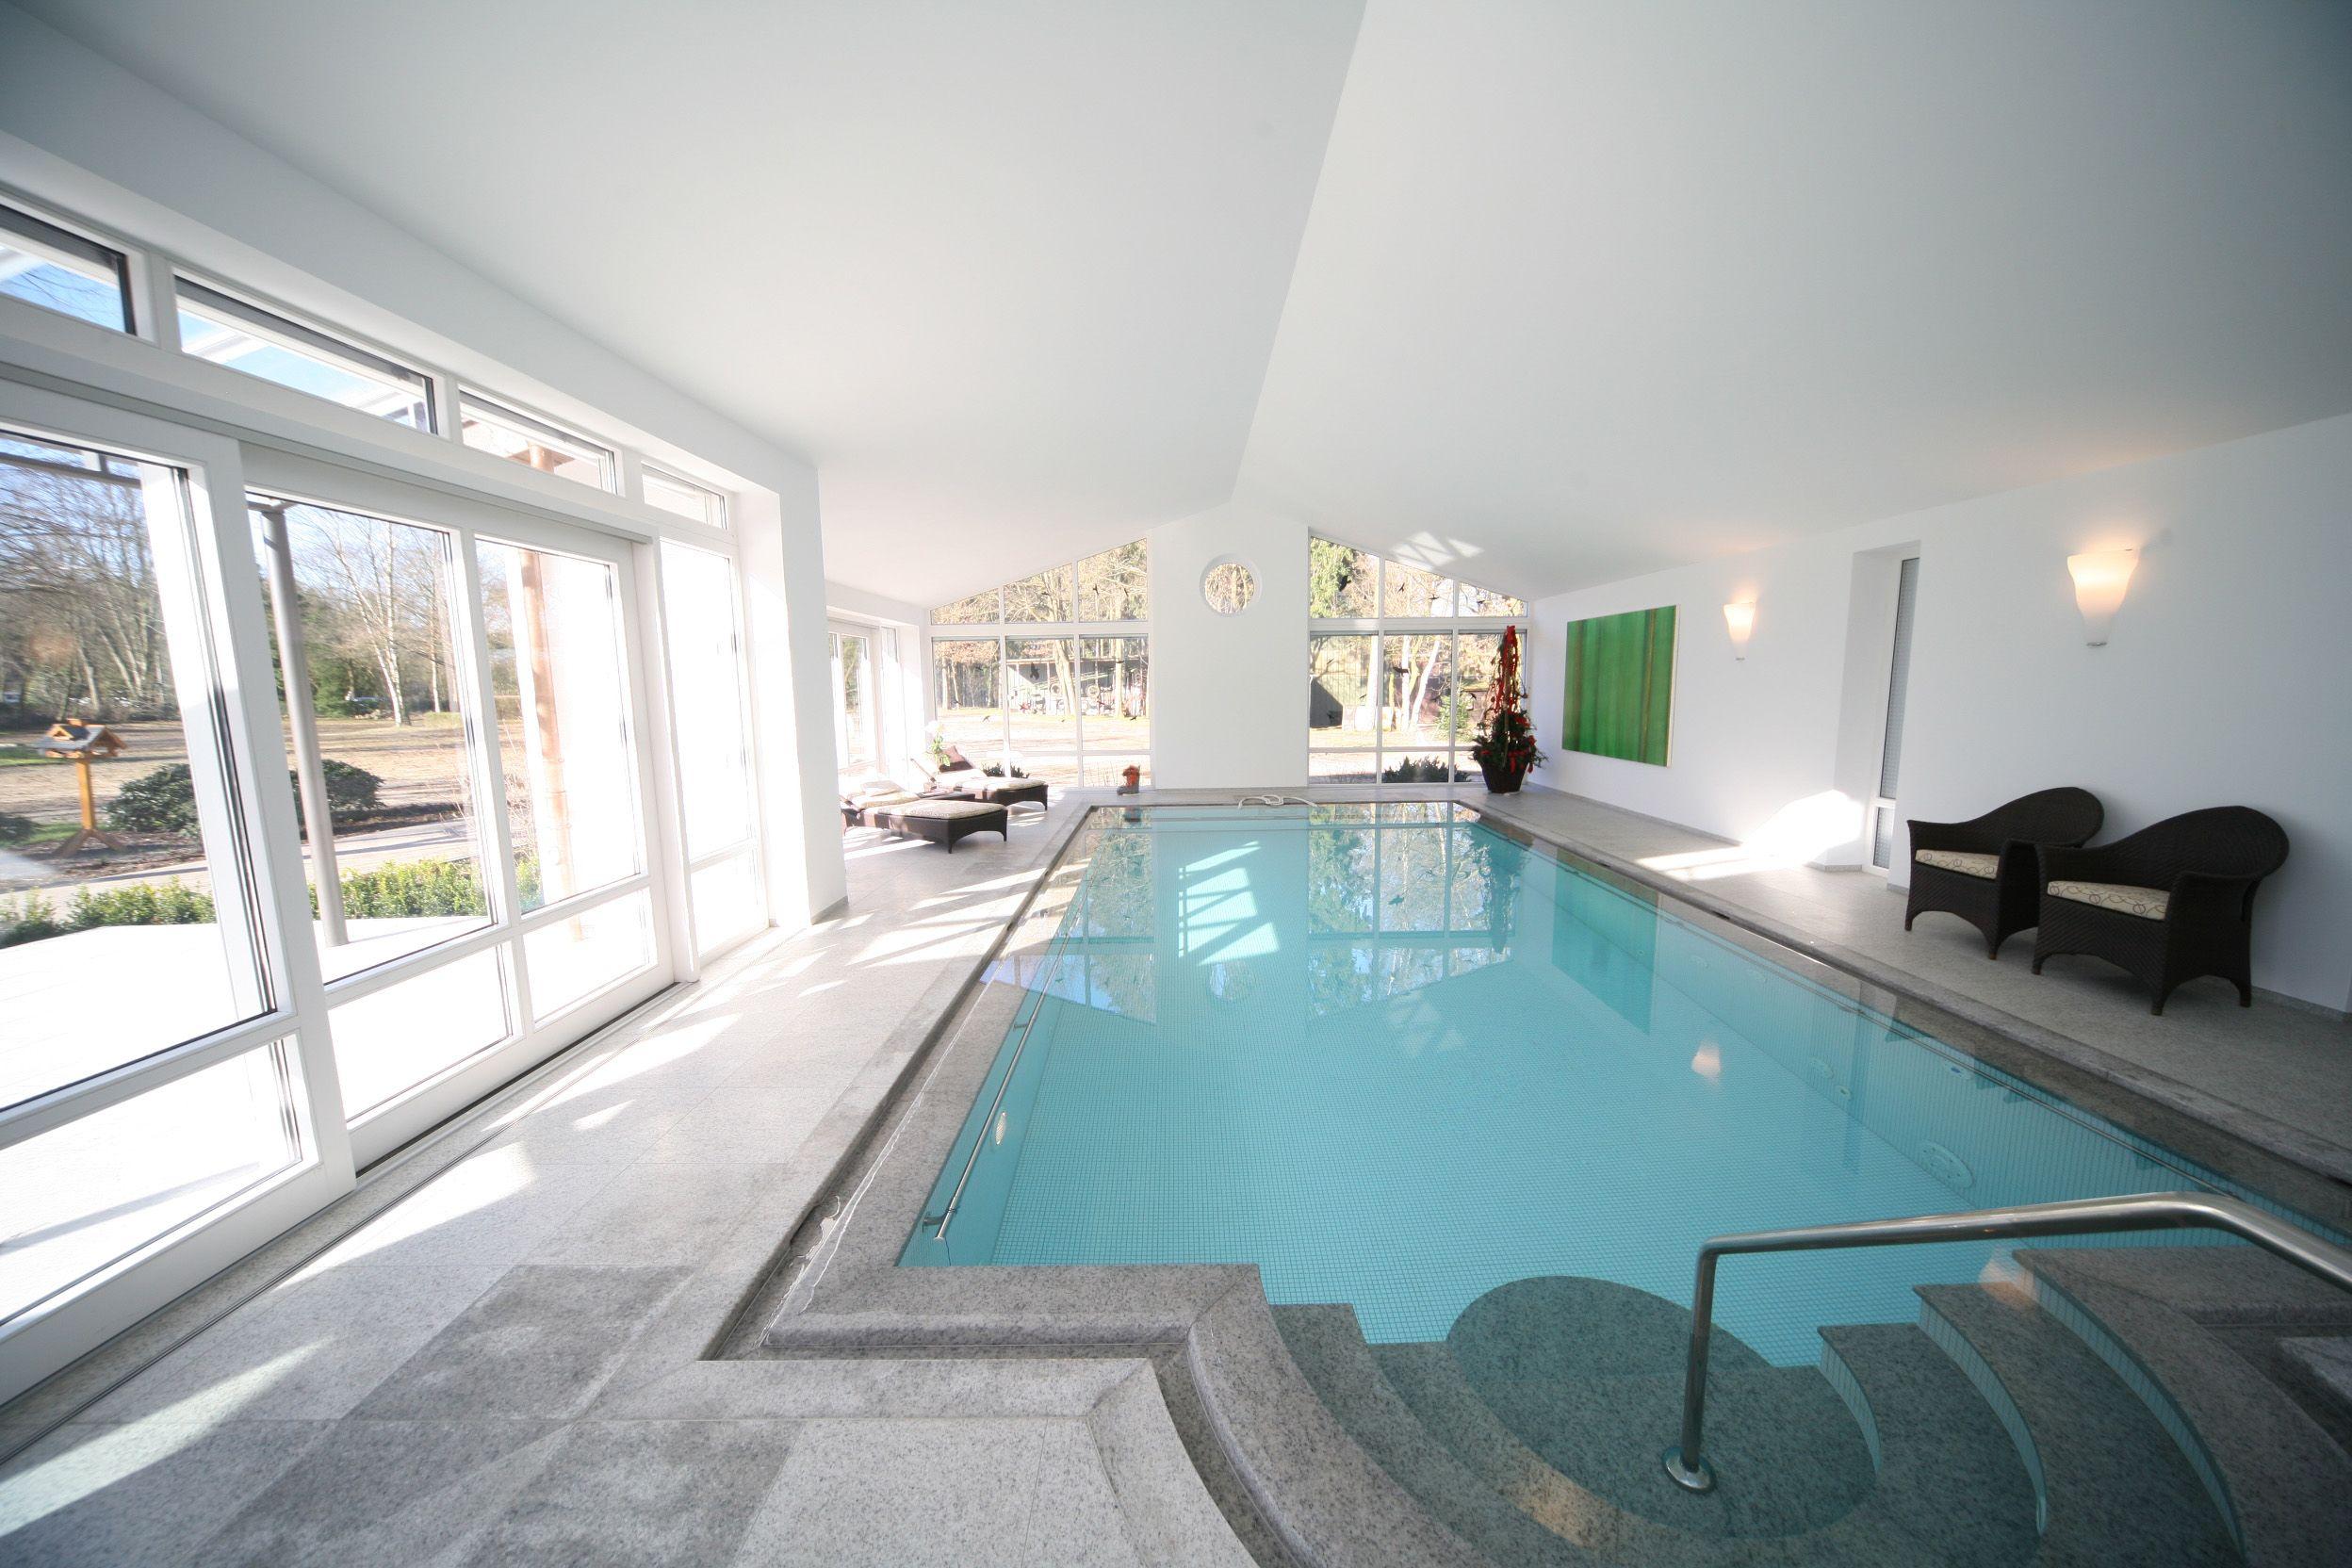 Indoor Pool Einfamilienhaus Loopelecom Indoor Pool Bauen Traumhafte ...